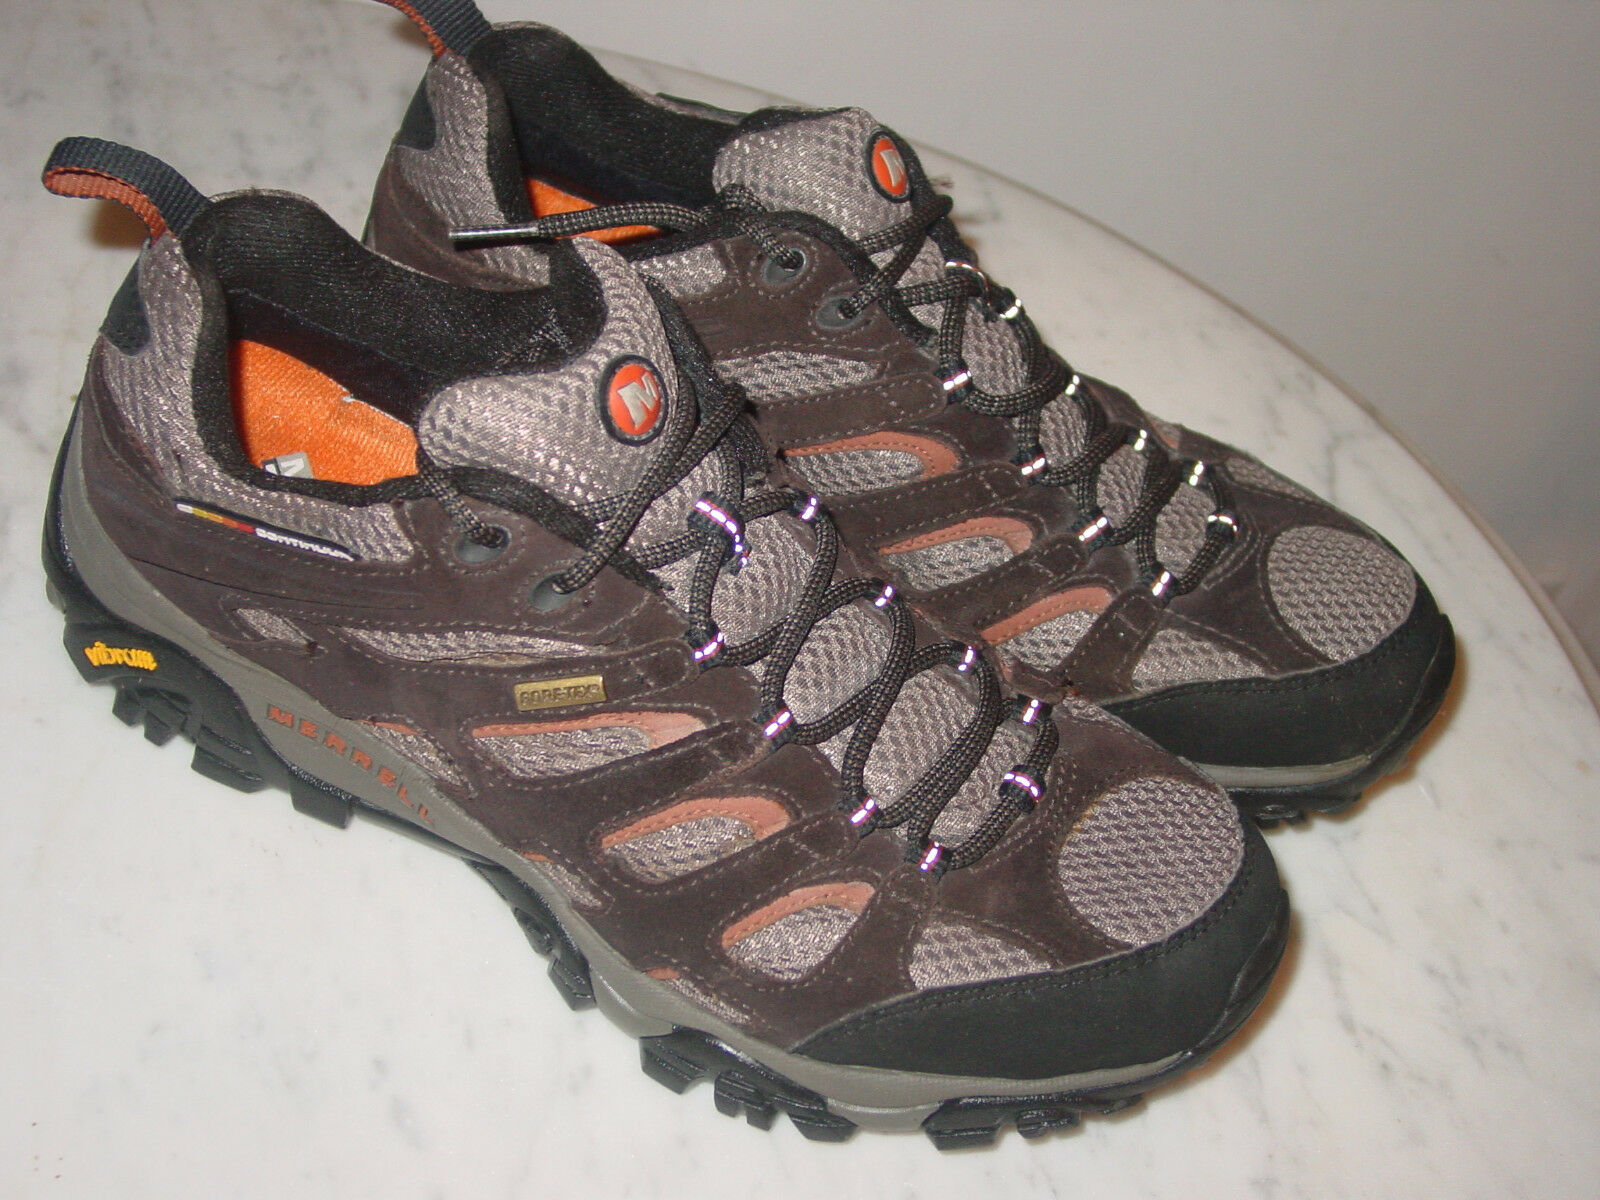 Mens Merrell Moab XCR GTX Ventilator J86905 Espersso Trail Hiking Hiking Hiking scarpe  Dimensione 9 20e007